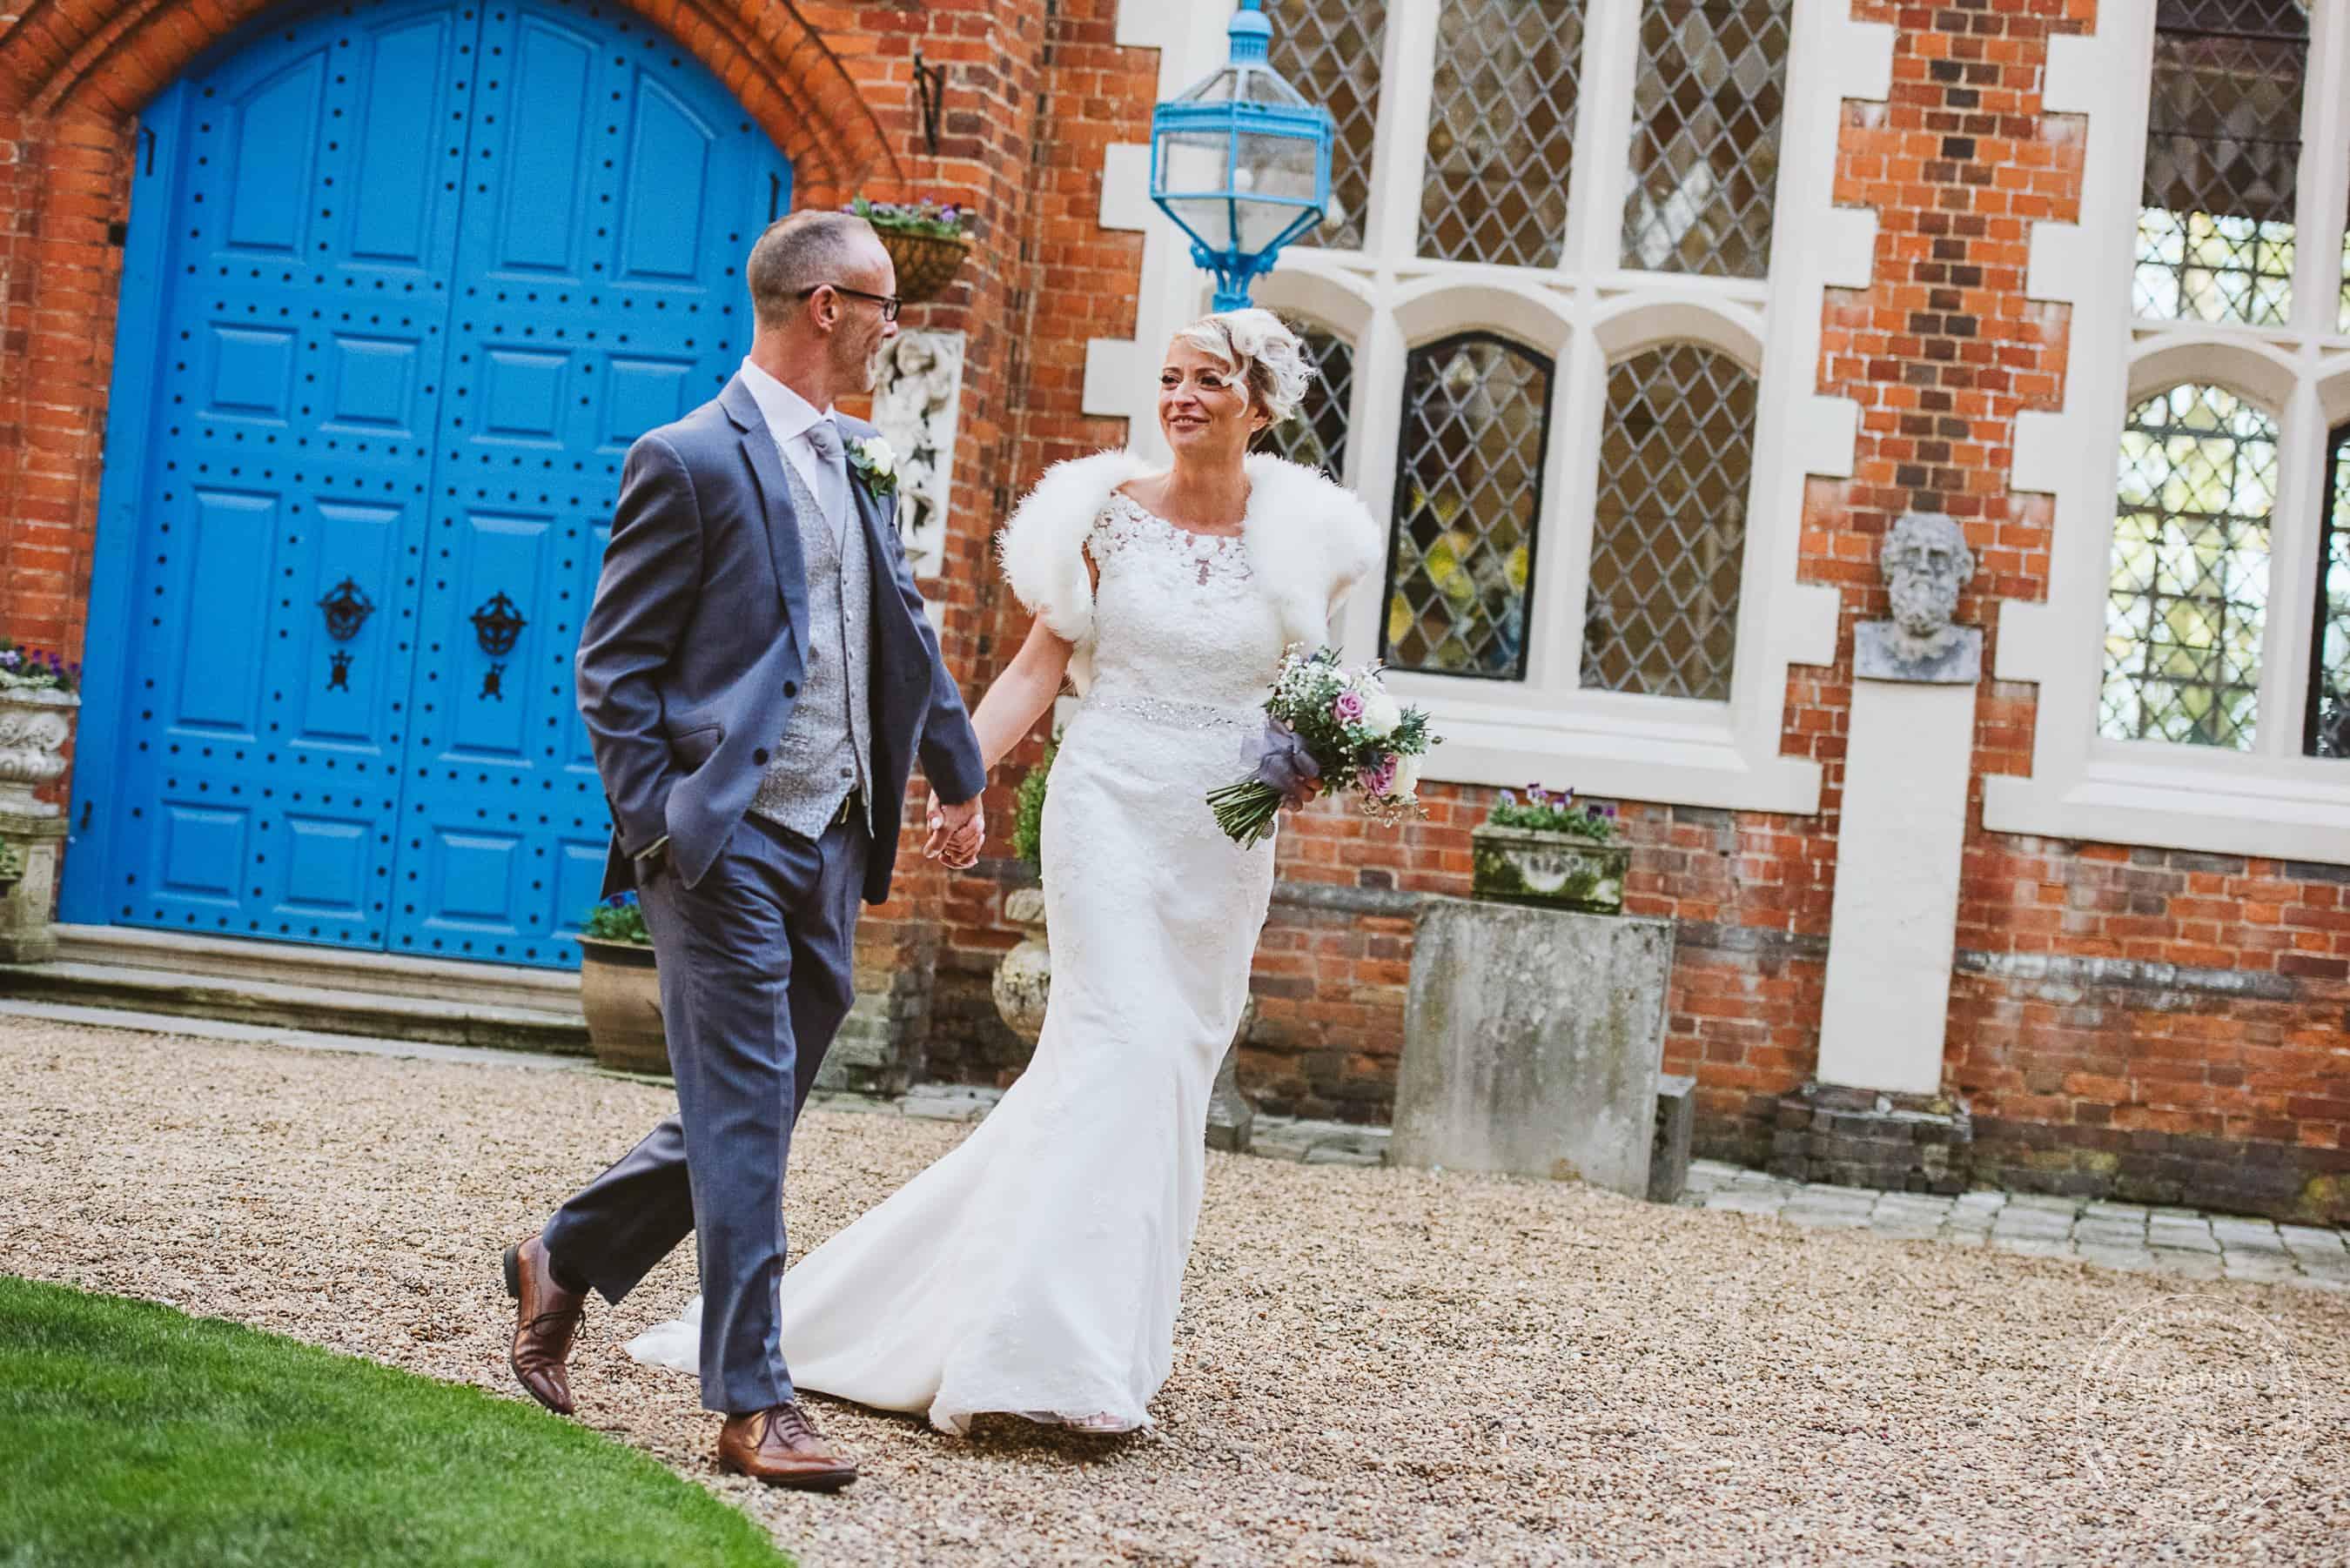 281018 Gosfield Hall Wedding Photography Lavenham Photographic 078